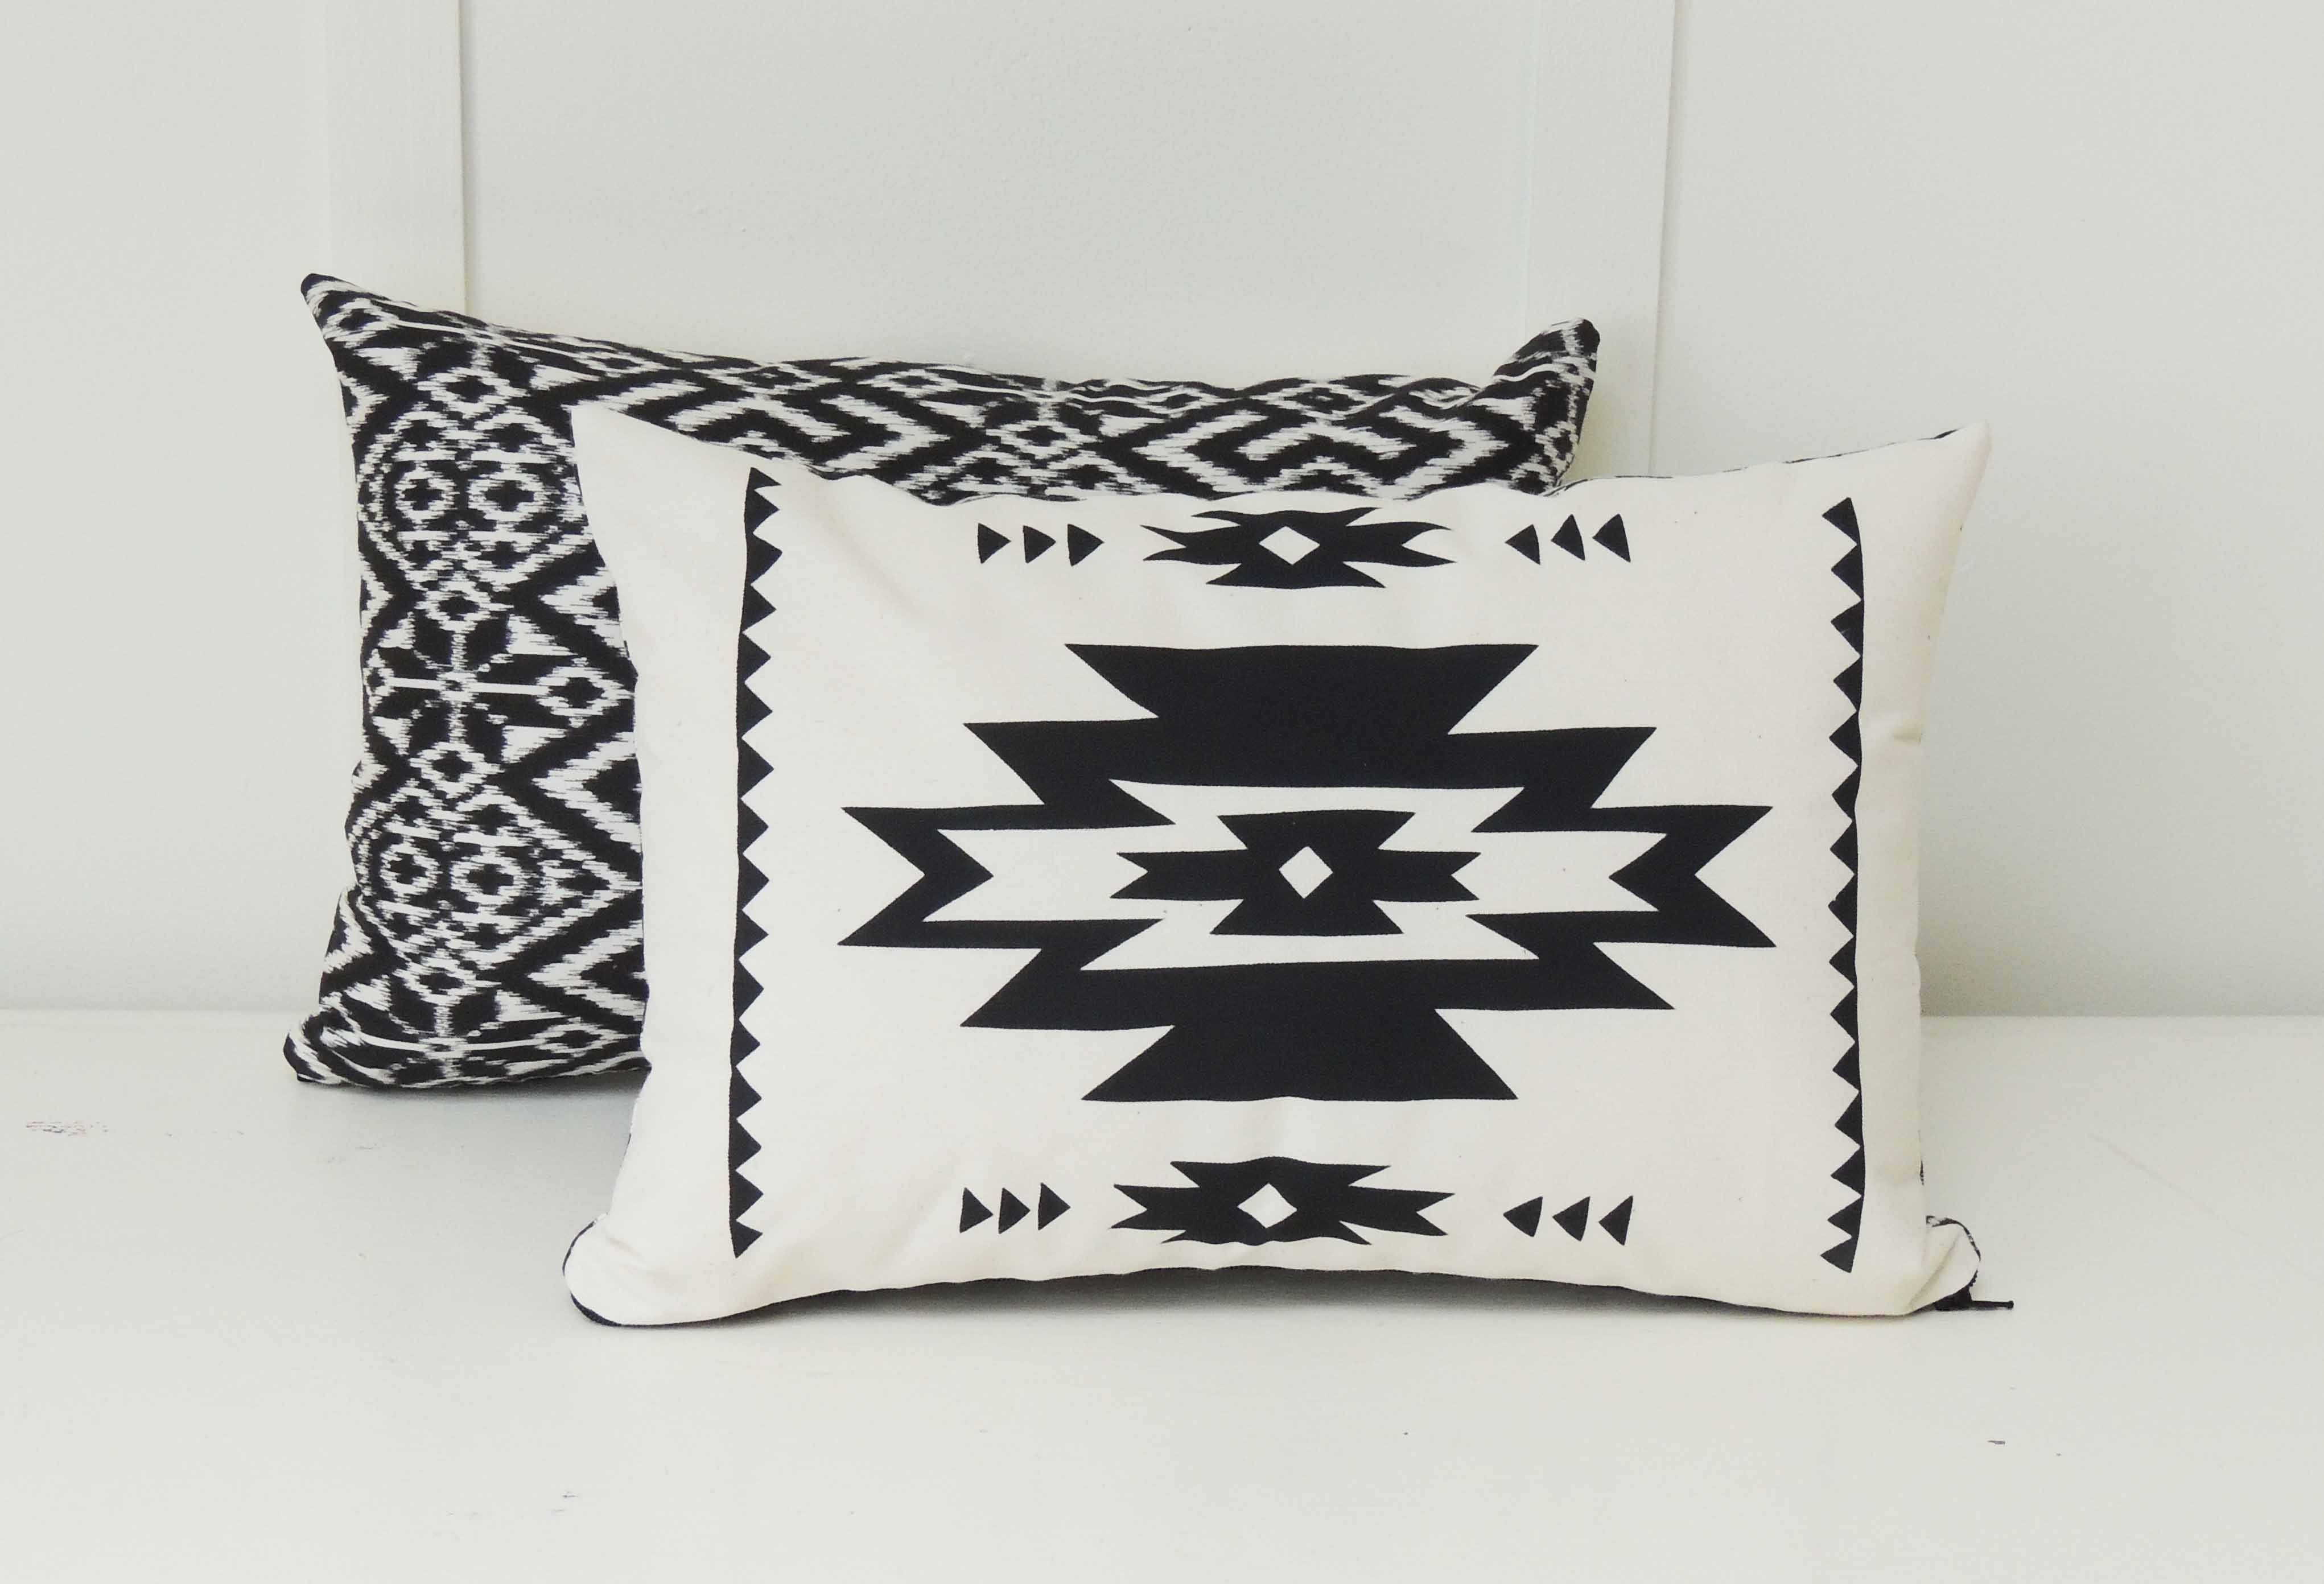 ponden hotel selling comfort home best pillow supreme lfc